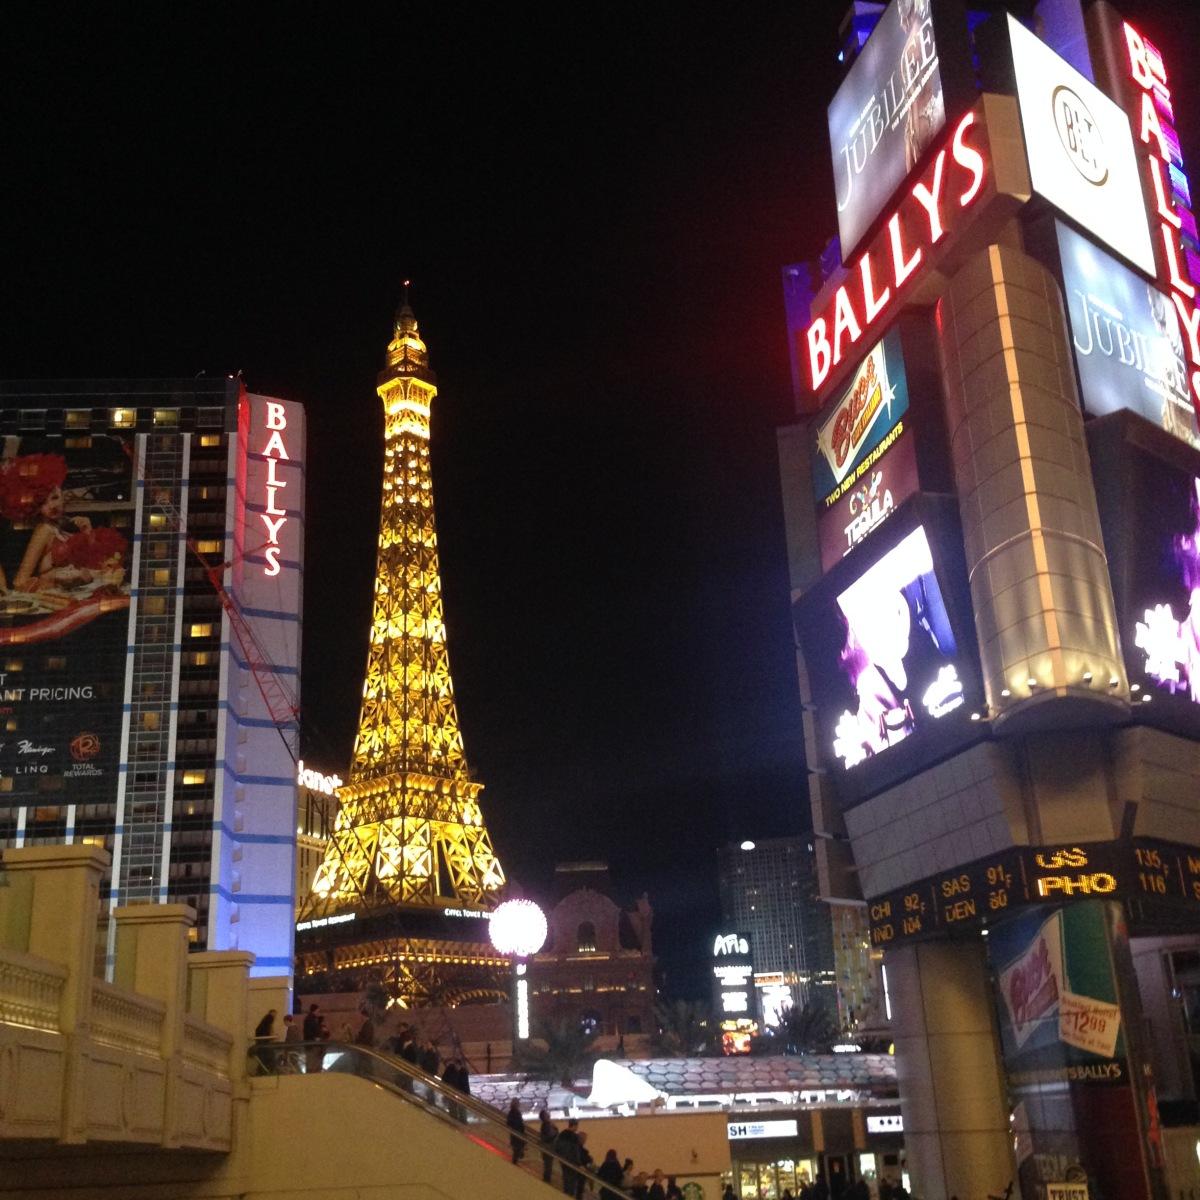 Paris, Las Vegas, Attraktion, Touristenattraktion, Sehenswürdigkeit, Eiffelturm, Amerika